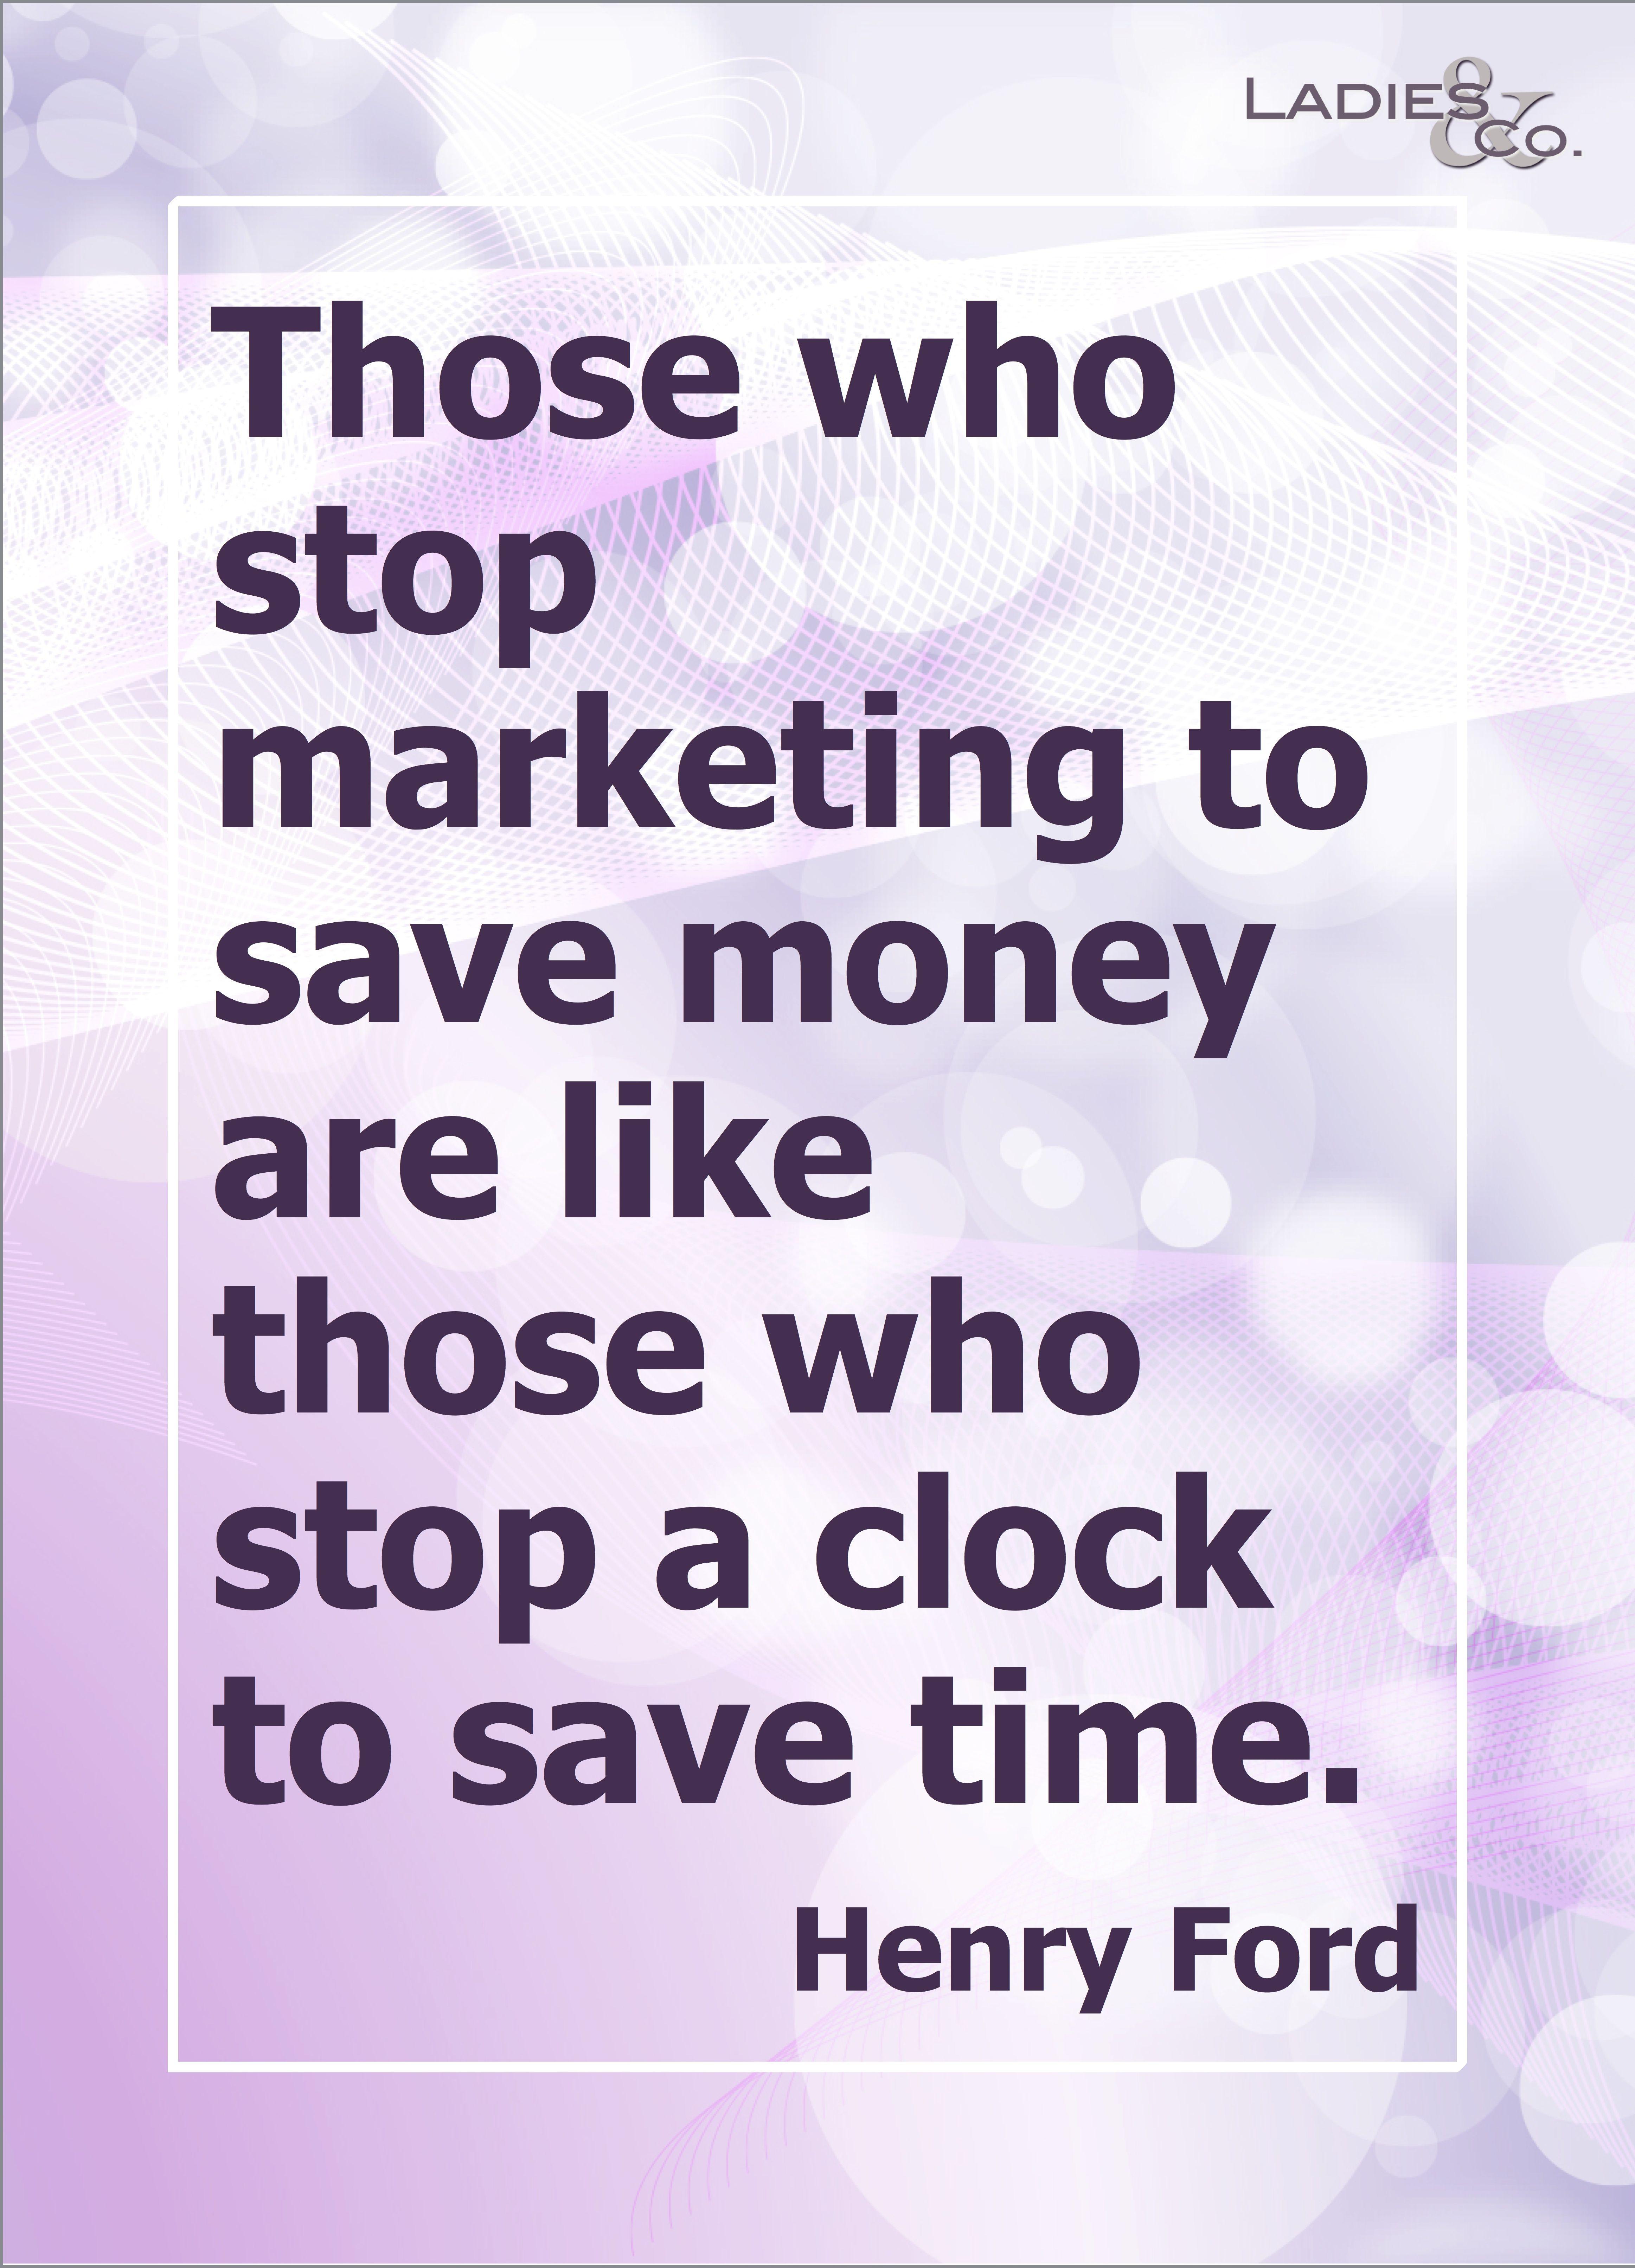 Citaten Zoeken Zoo : Those who stop marketing to save money are like